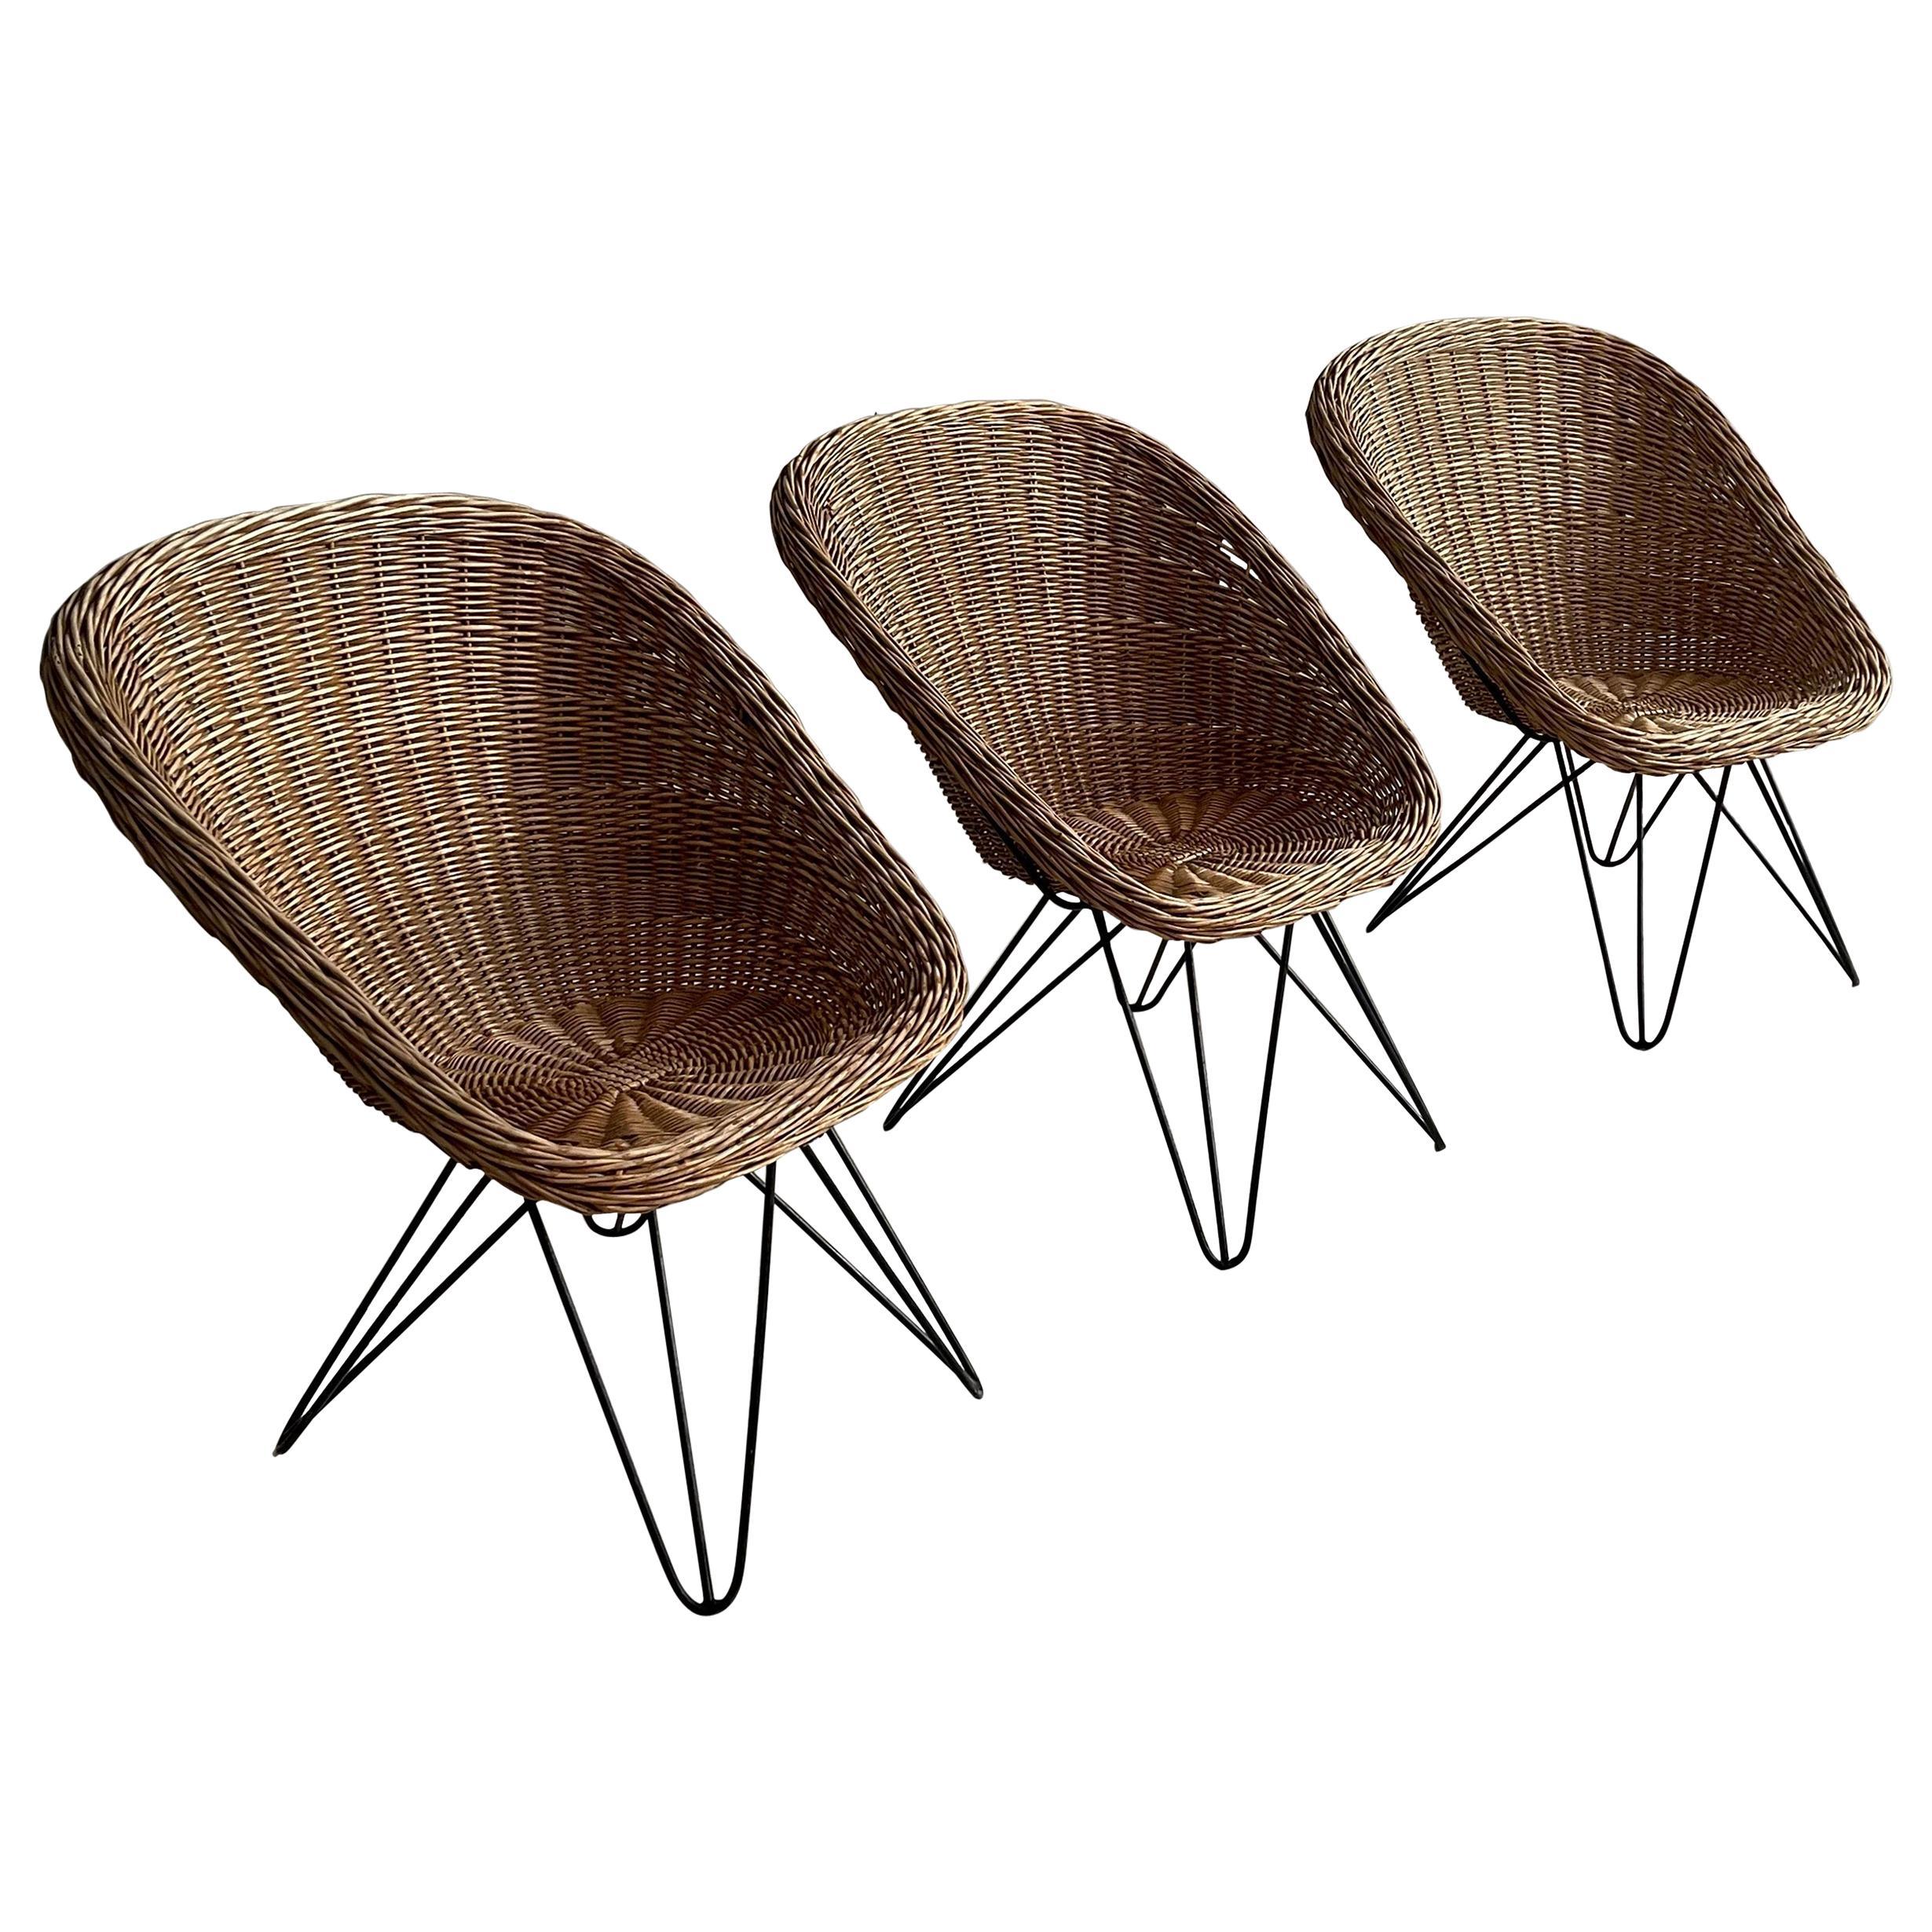 Wicker Lounge Chairs by Sonnet, Austria, 1950s